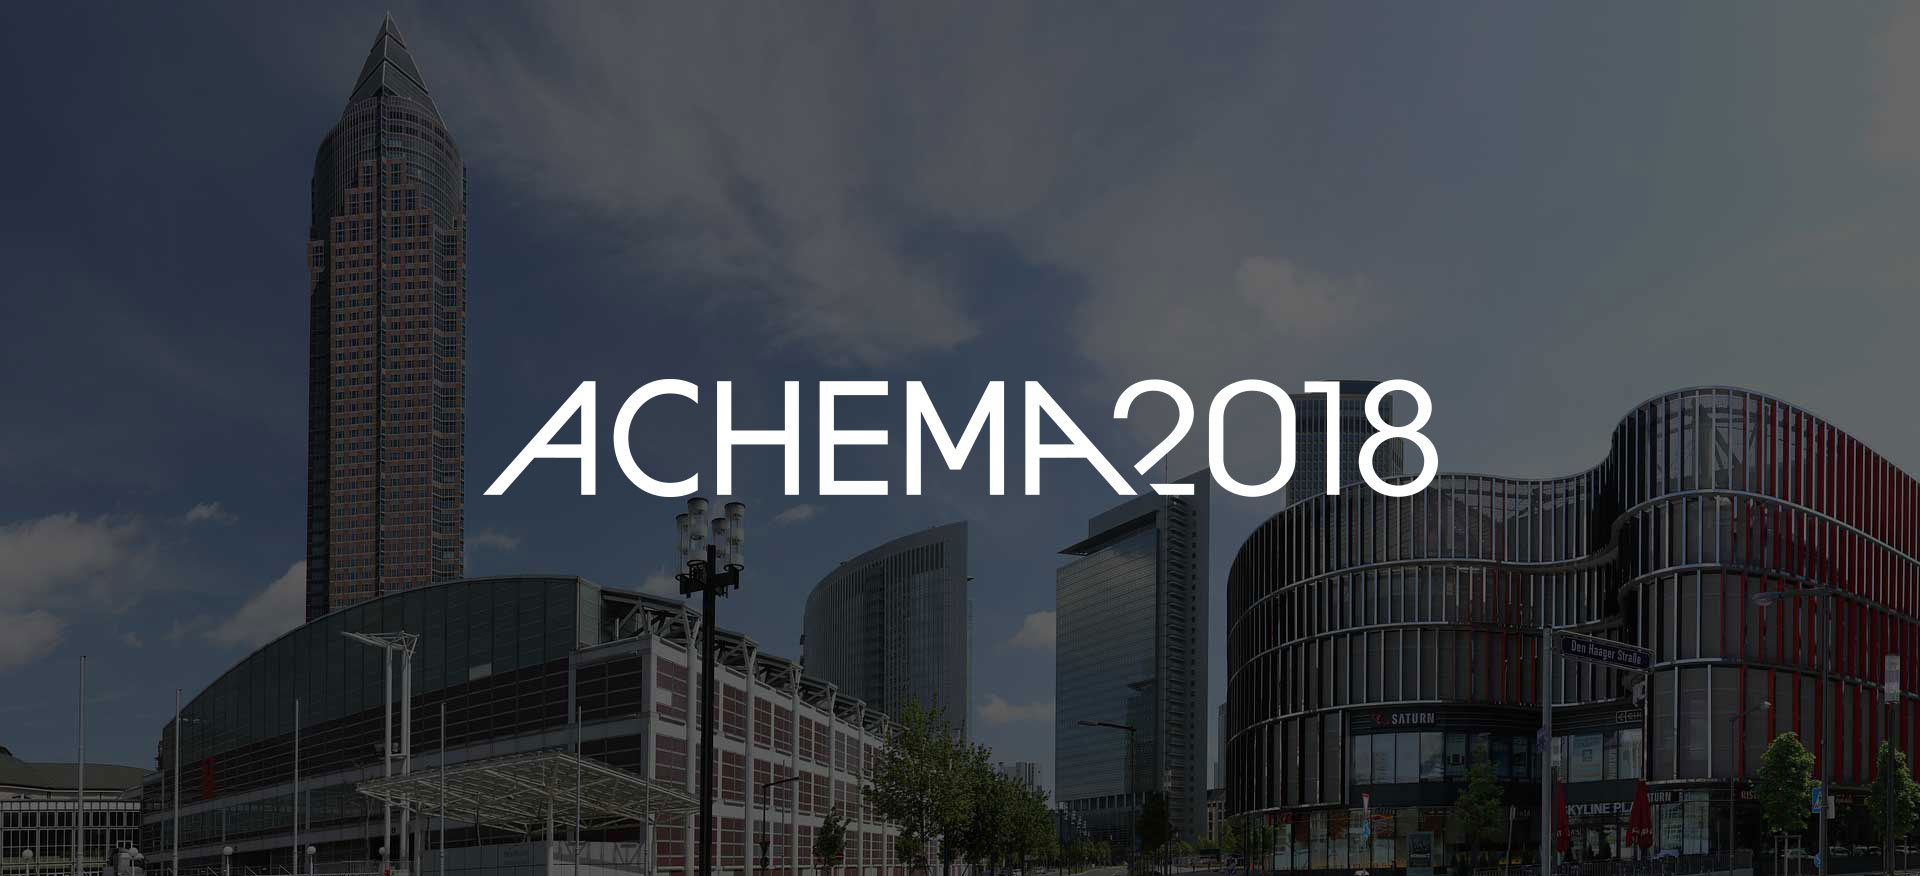 ACHEMA 2018 in Frankfurt